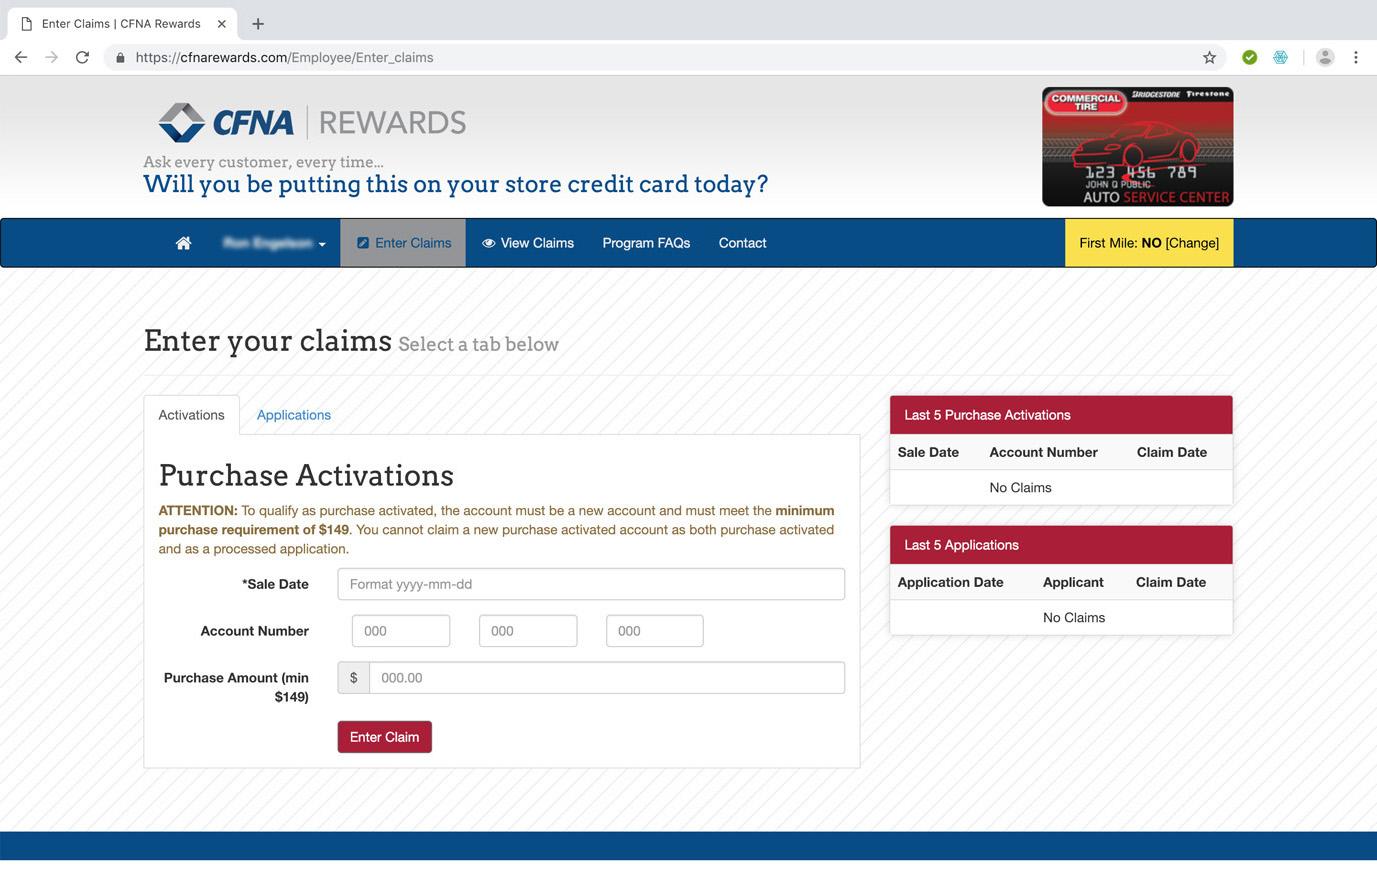 CFNA Rewards Claims